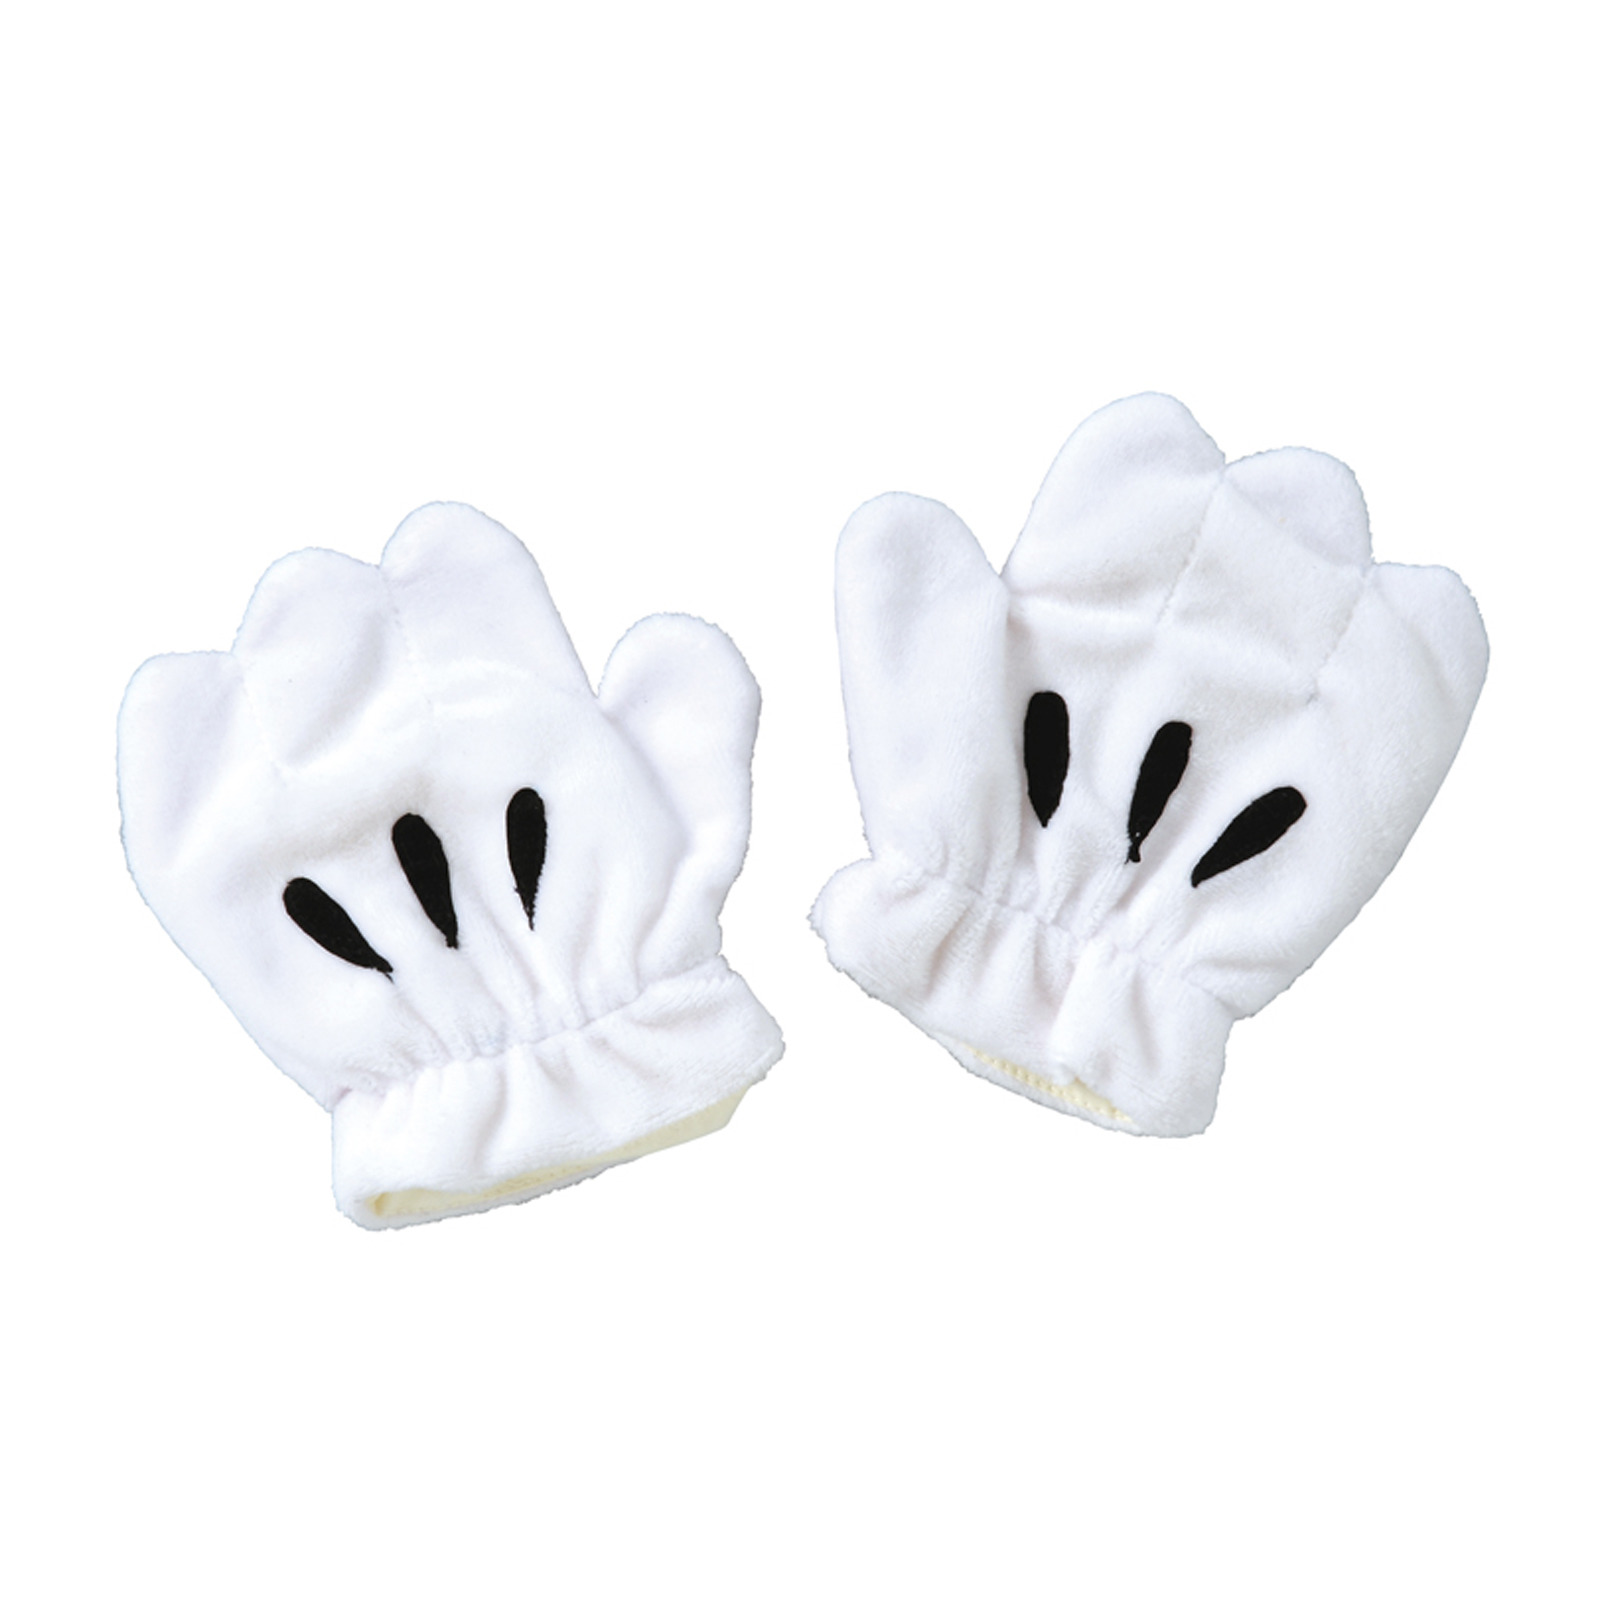 Tomy Disney Dear Little Hands Crispy Hands Mickey Mouse